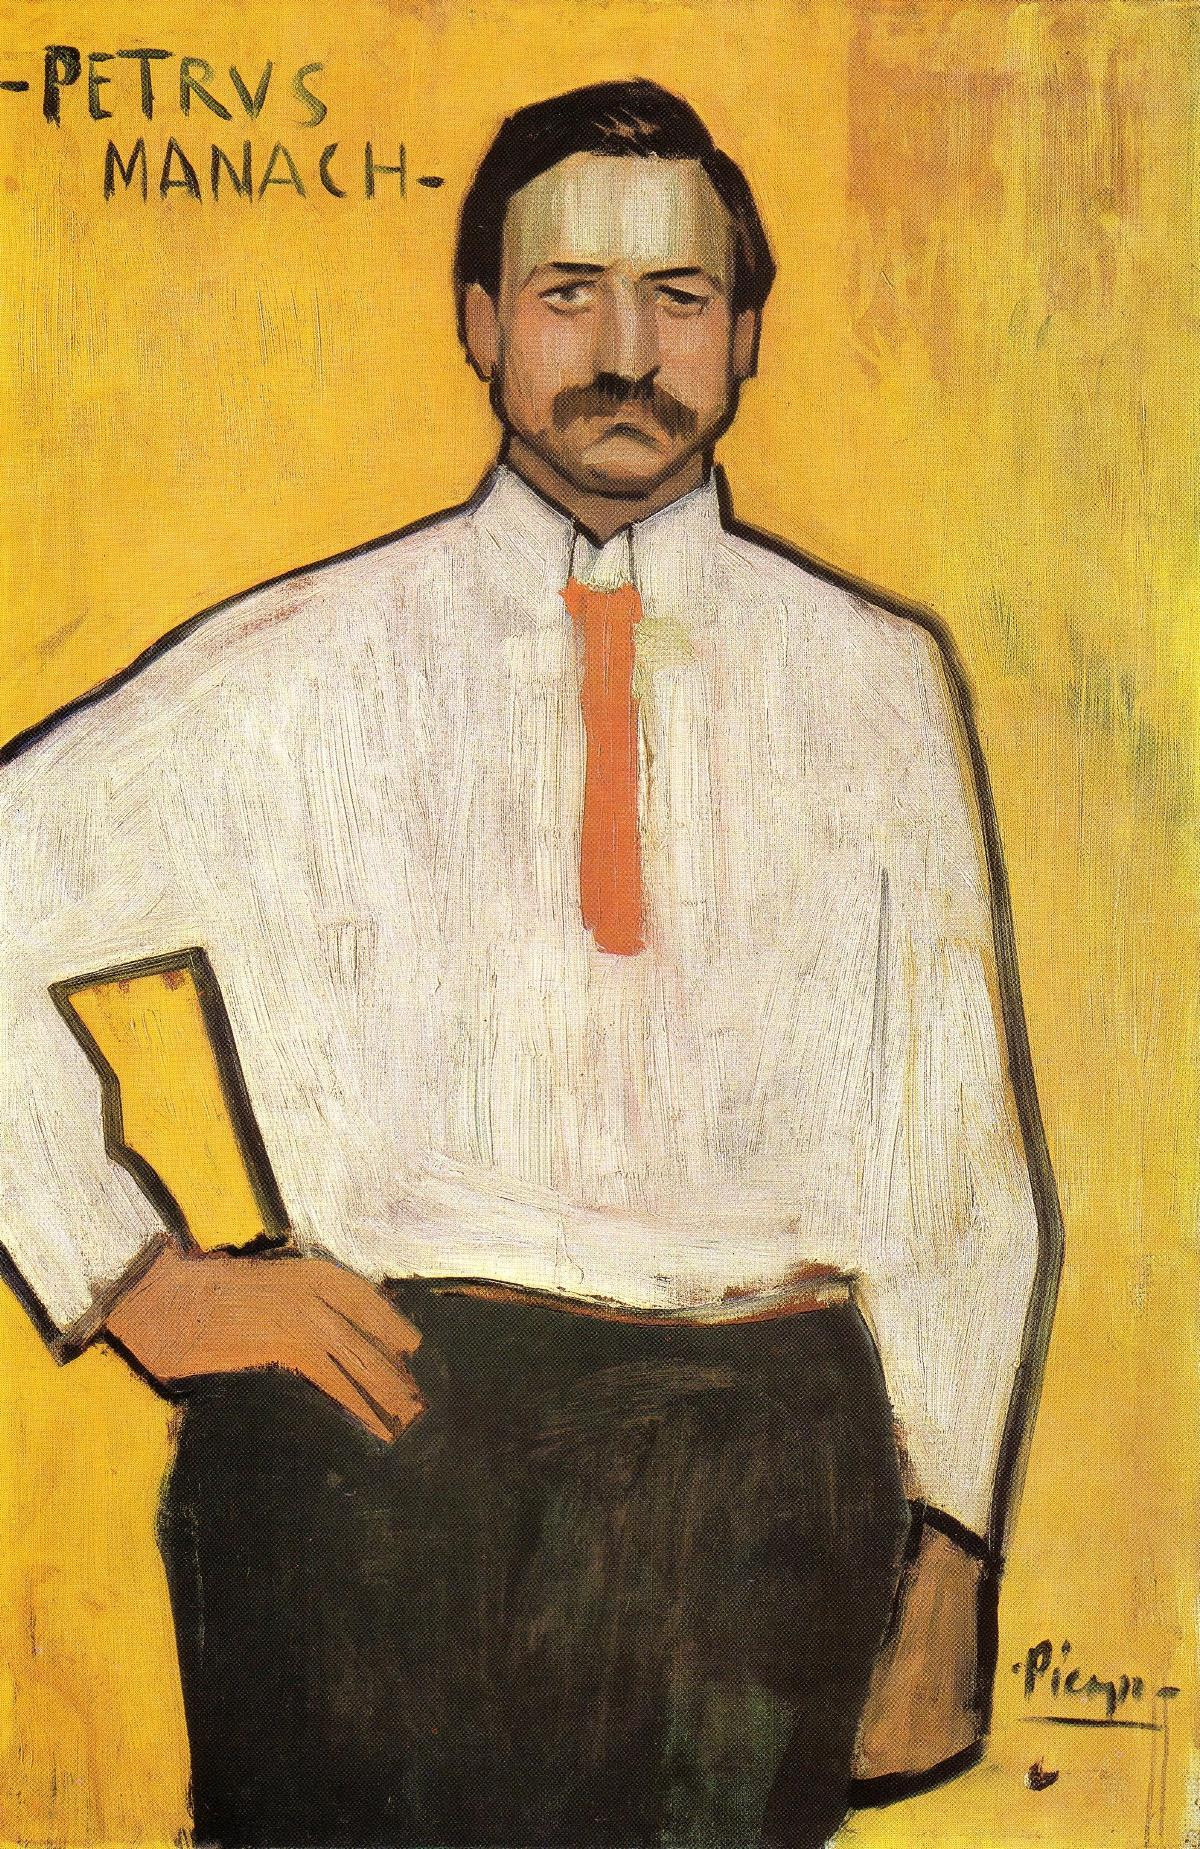 Pedro-Manach-(1901)